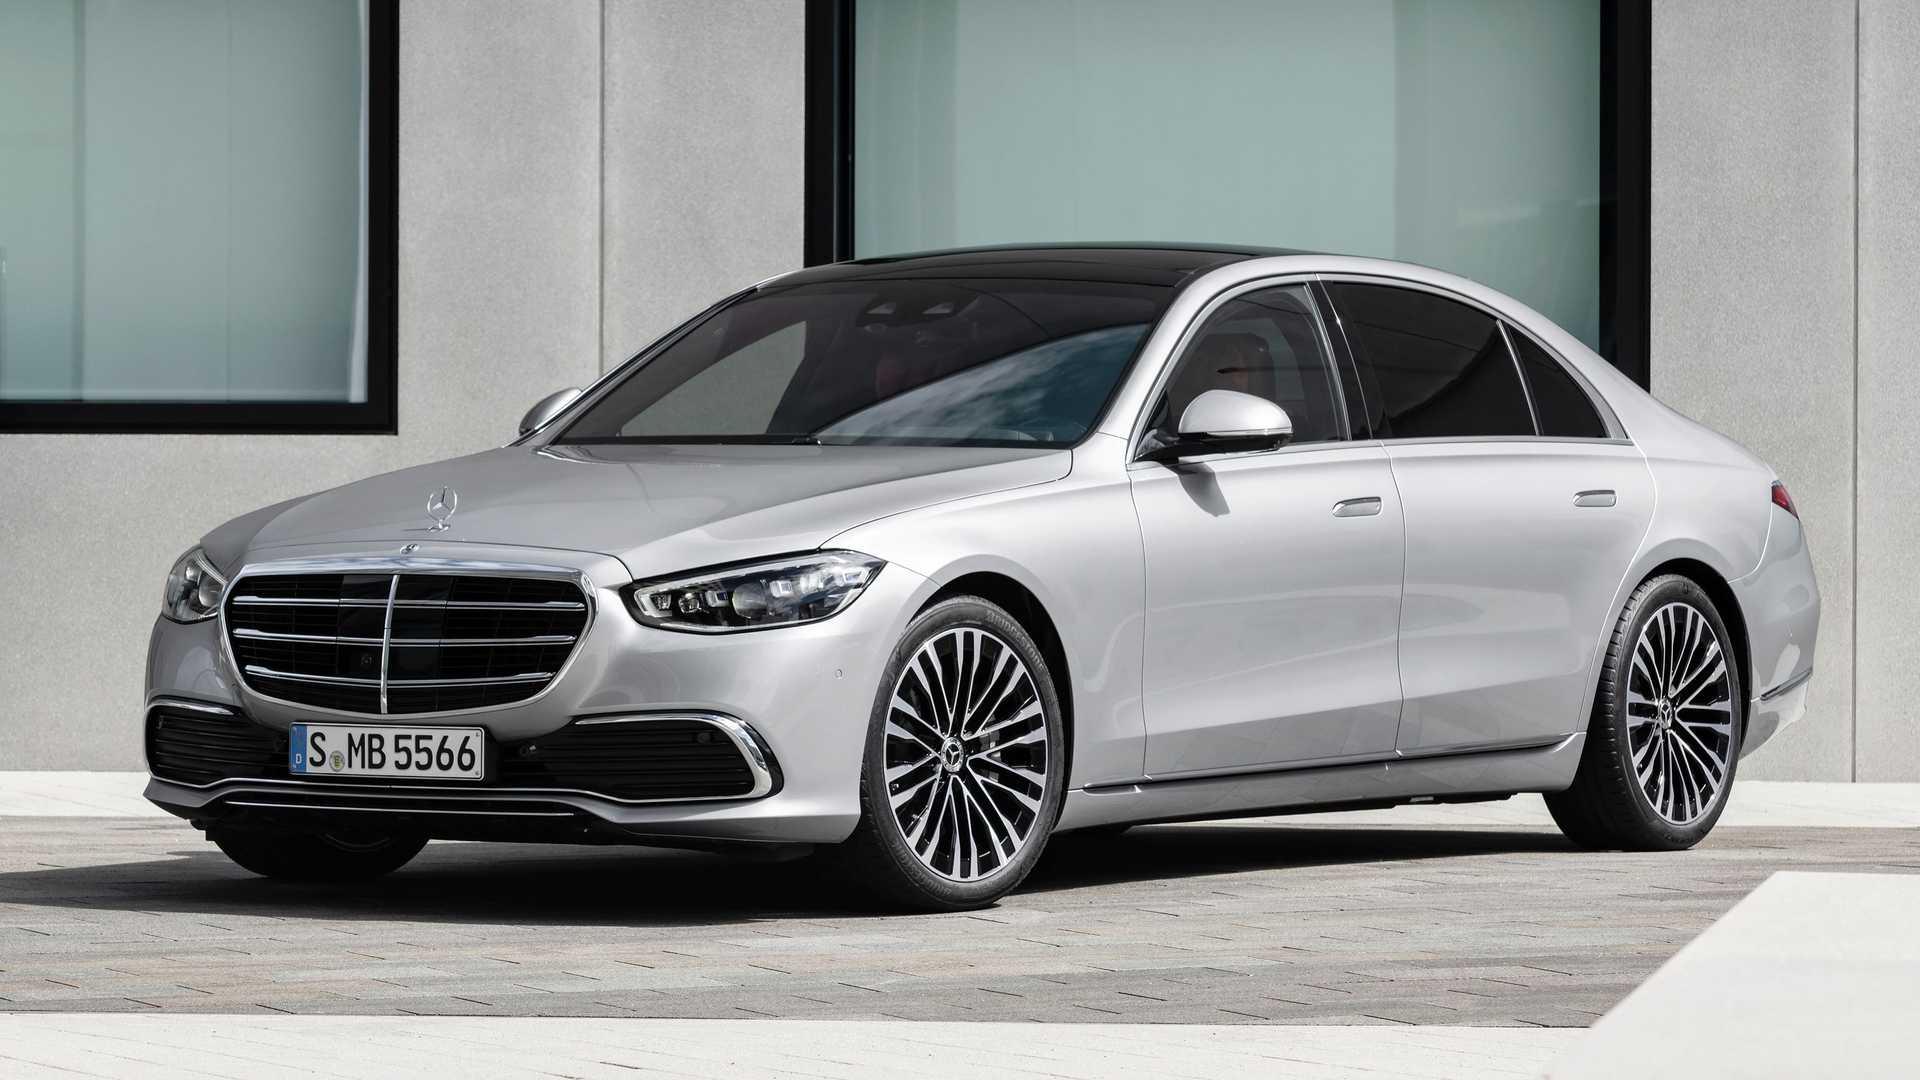 2021-mercedes-benz-s-class-sedan-exterior